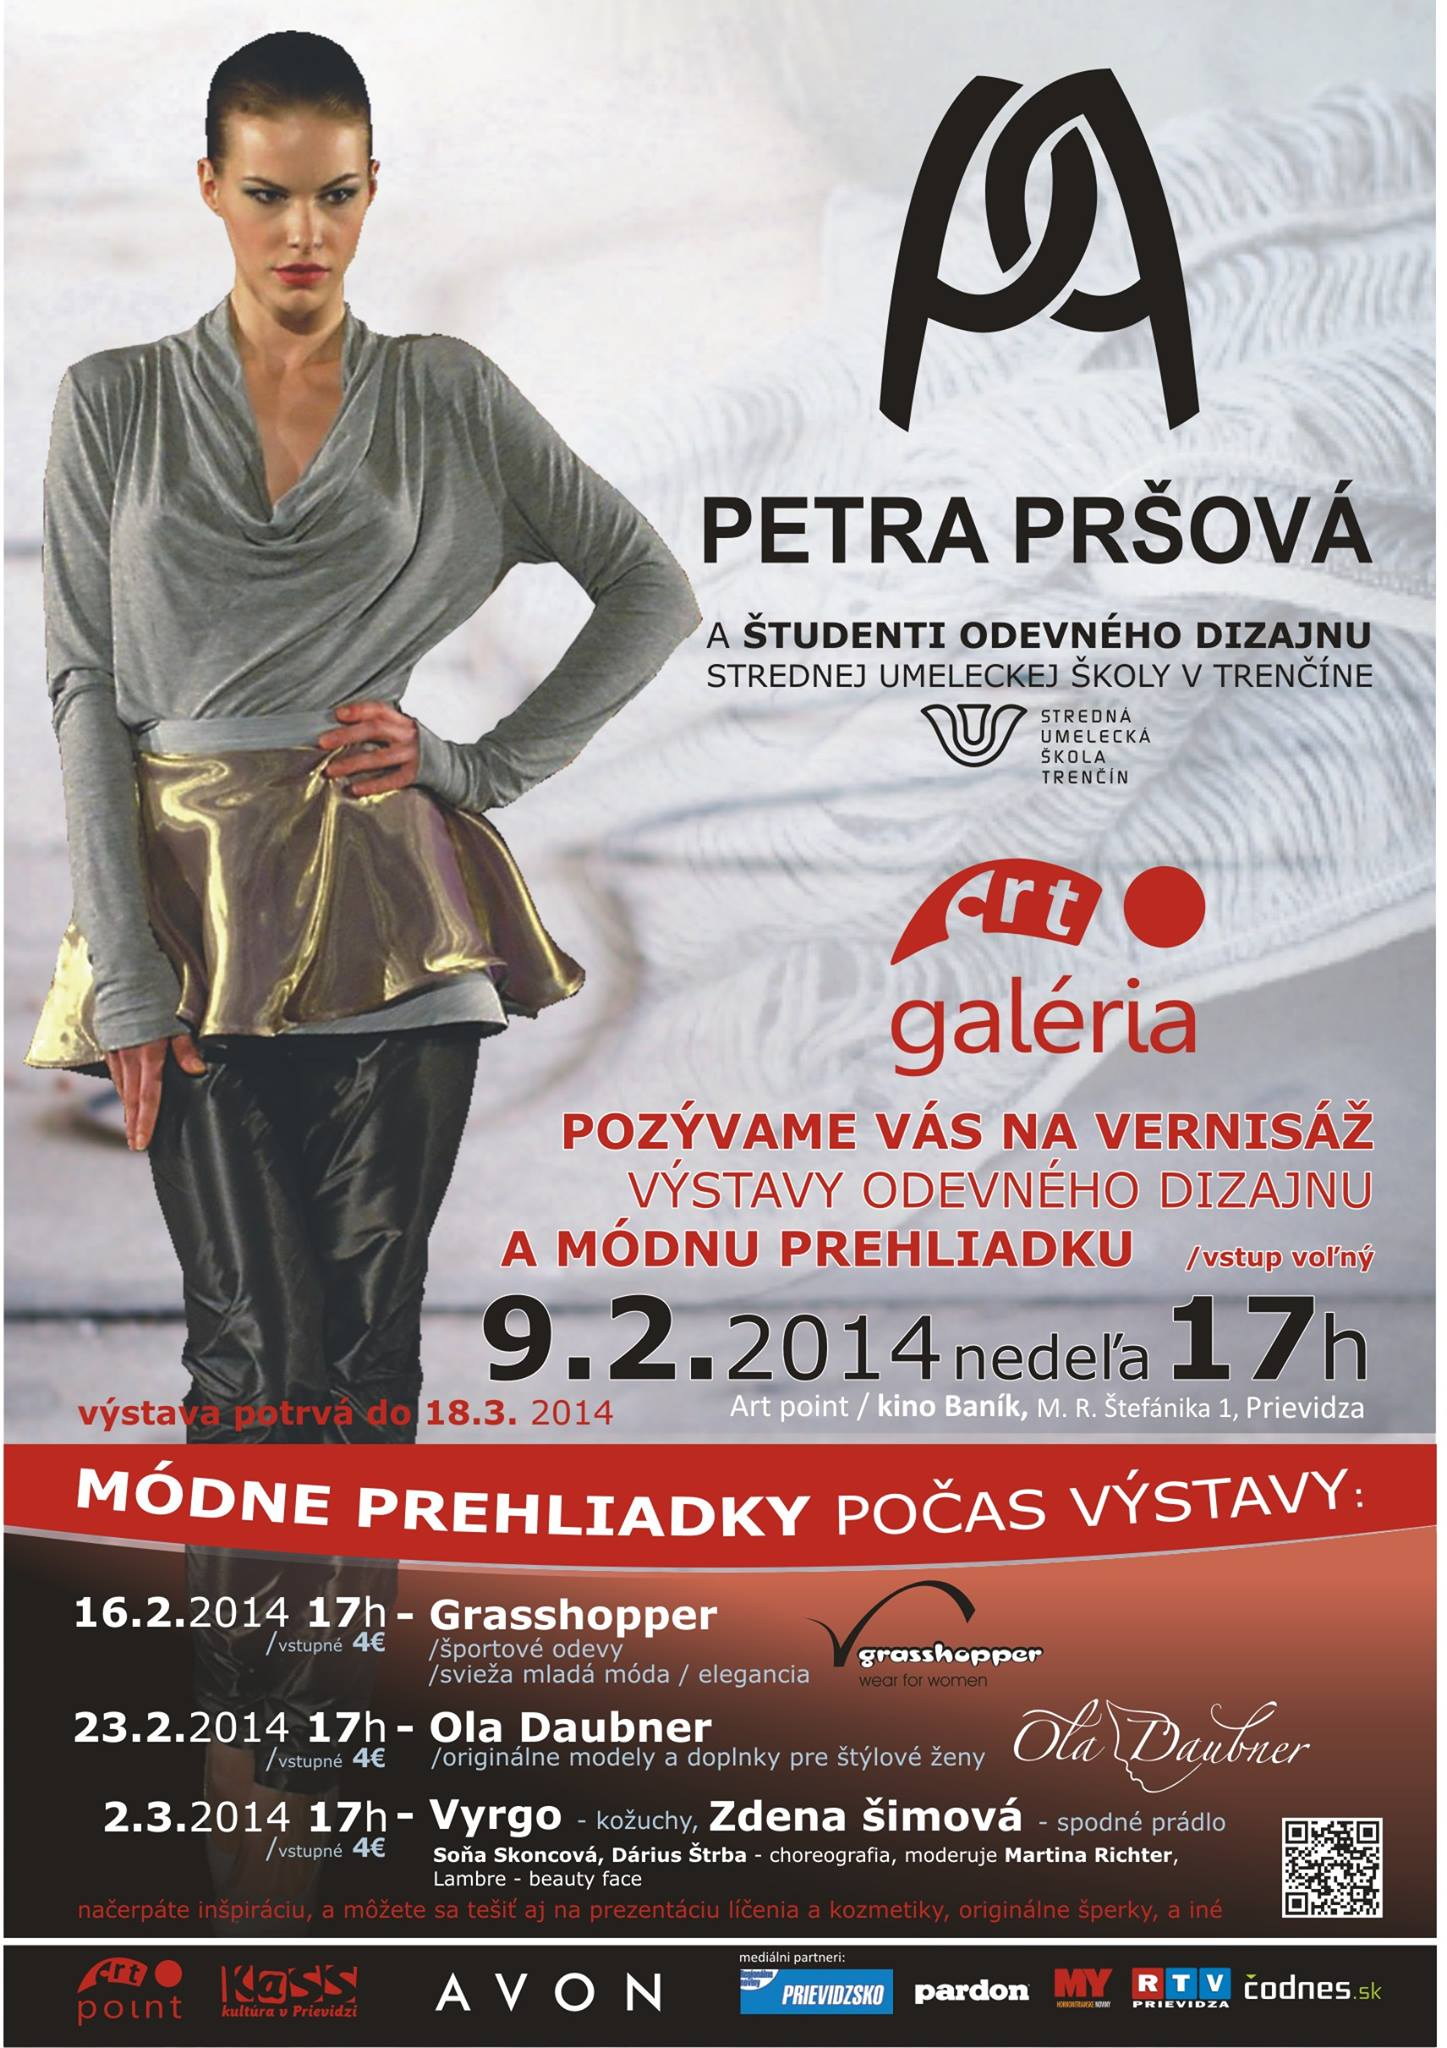 Výstava odevného dizajnu Petra Pršová a študent!